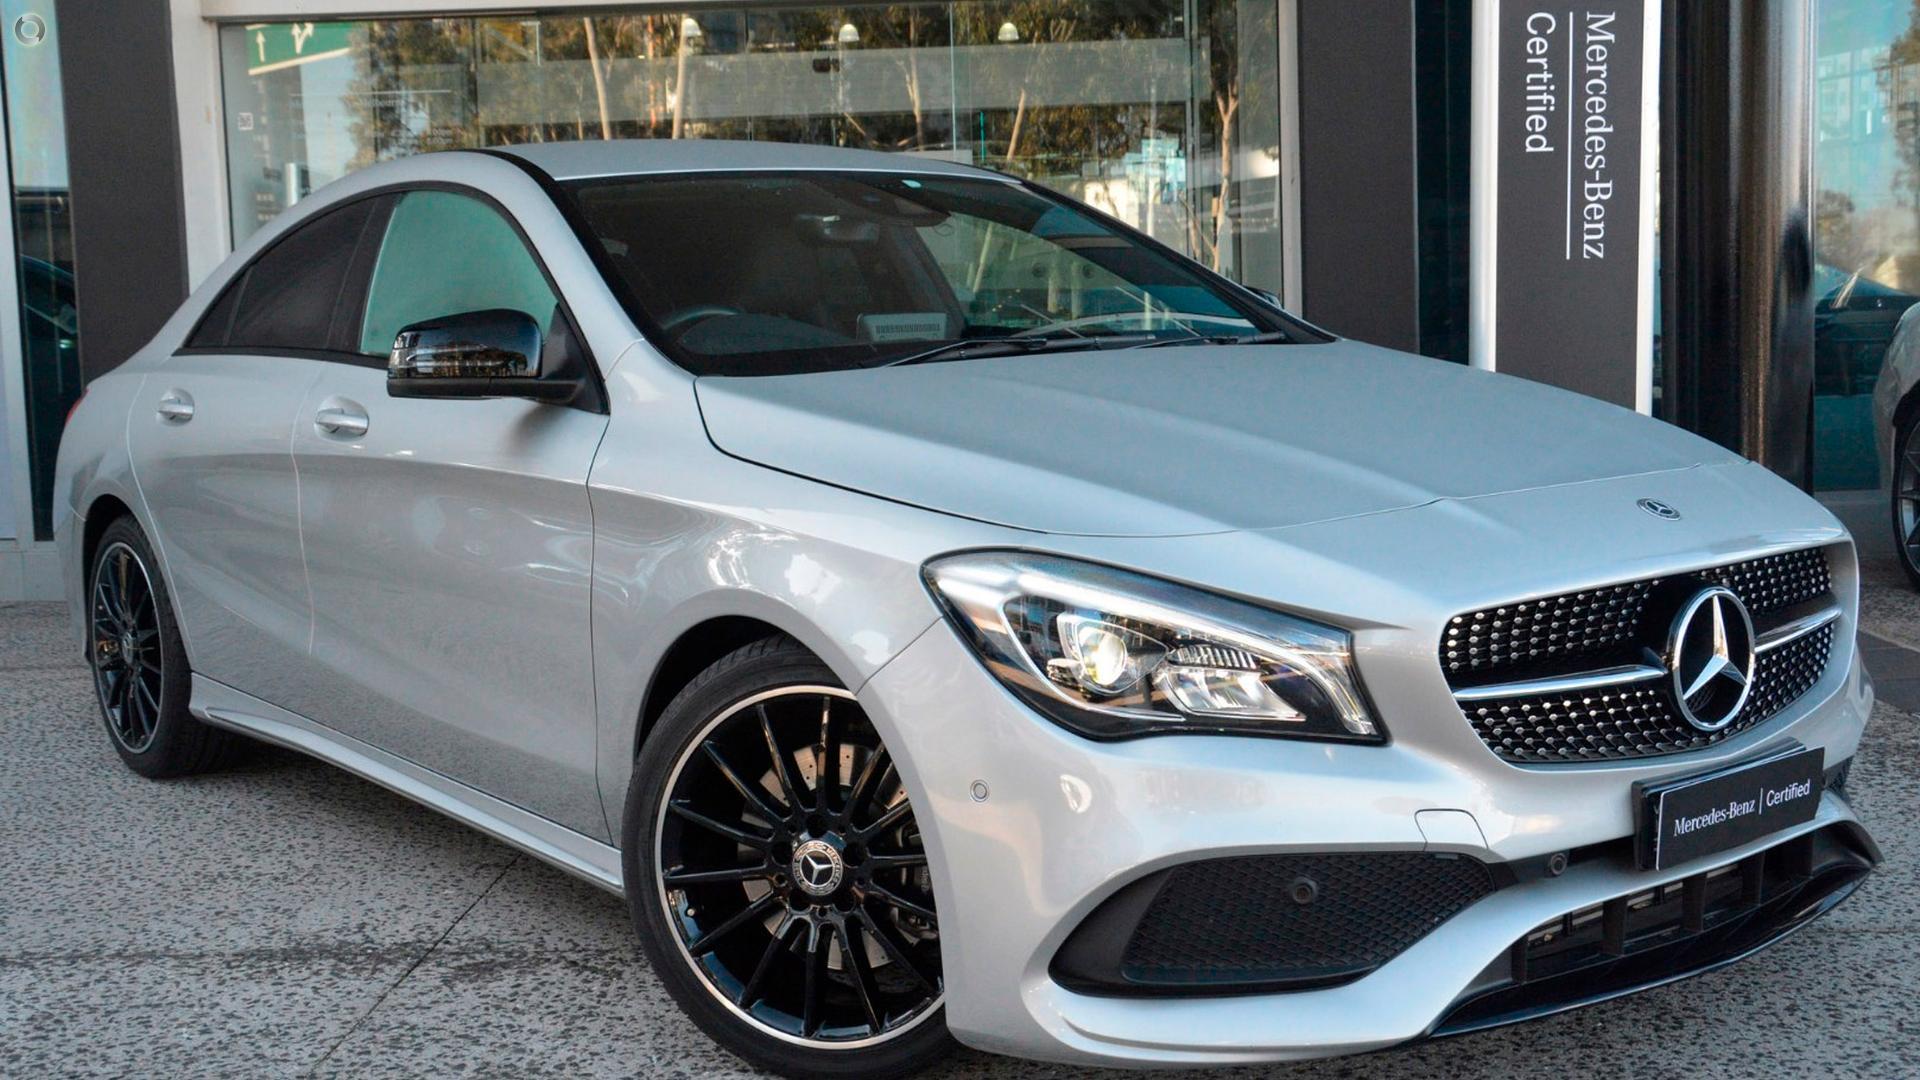 2017 Mercedes-Benz CLA 220 D Coupe